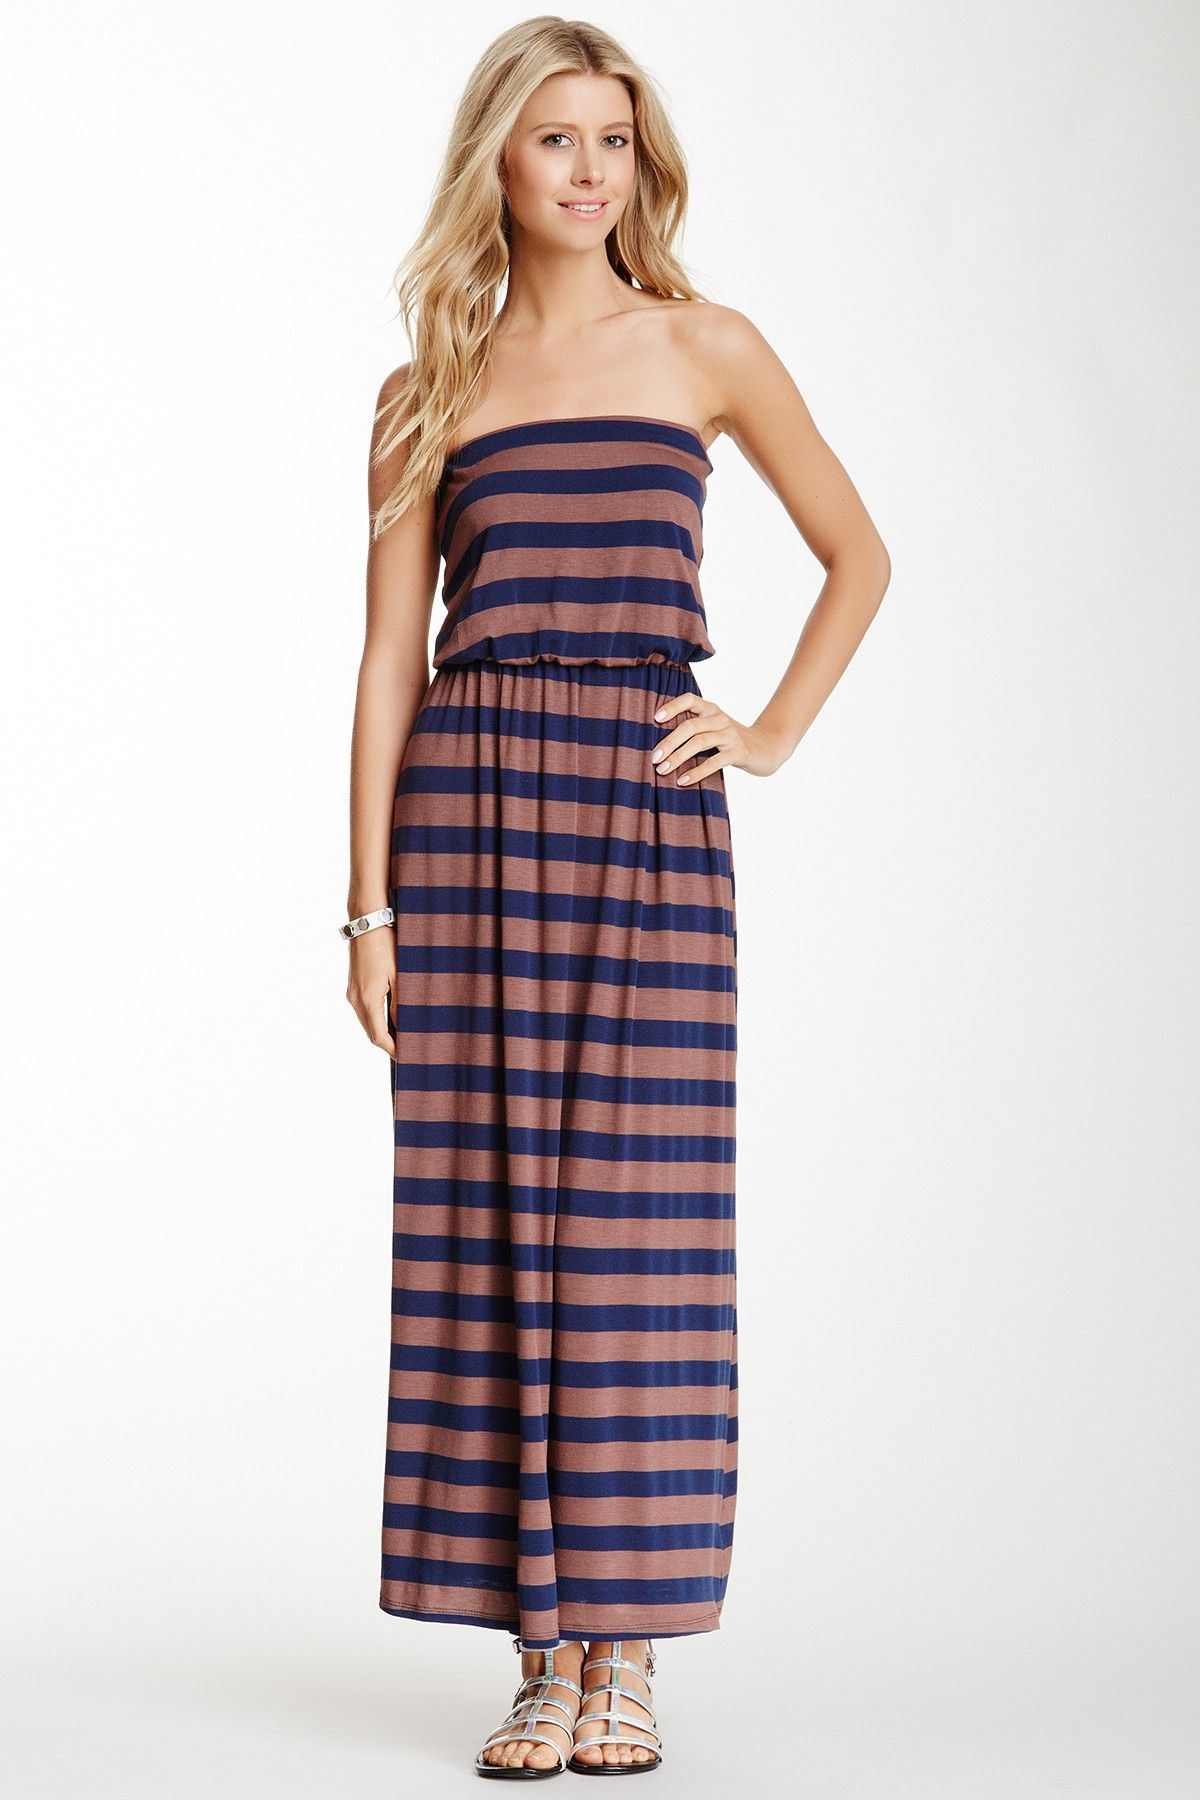 Frenzii striped maxi dress fashion women pinterest striped